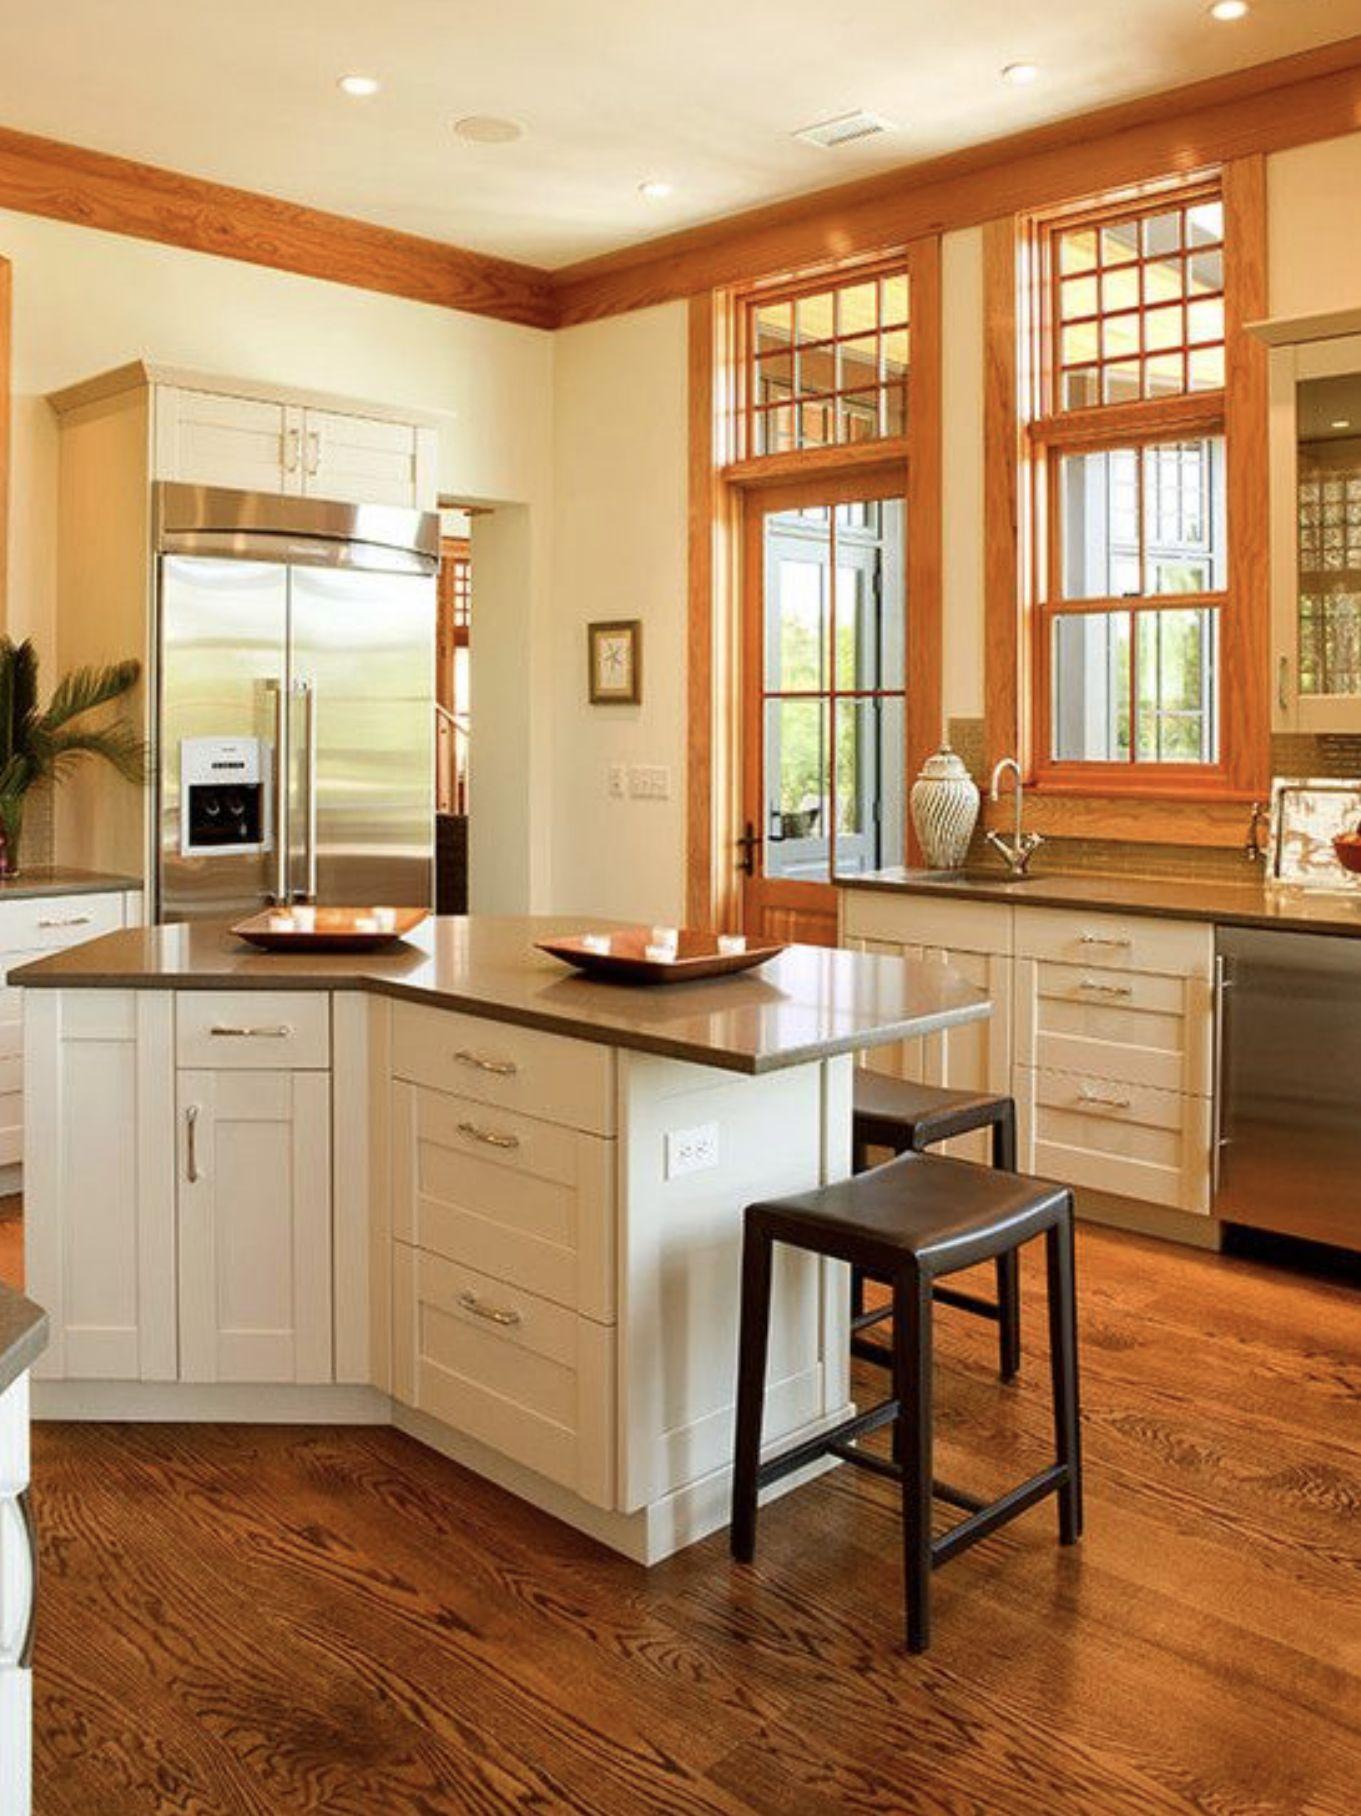 White cabinets and wood trim | Oak kitchen, Kitchen interior